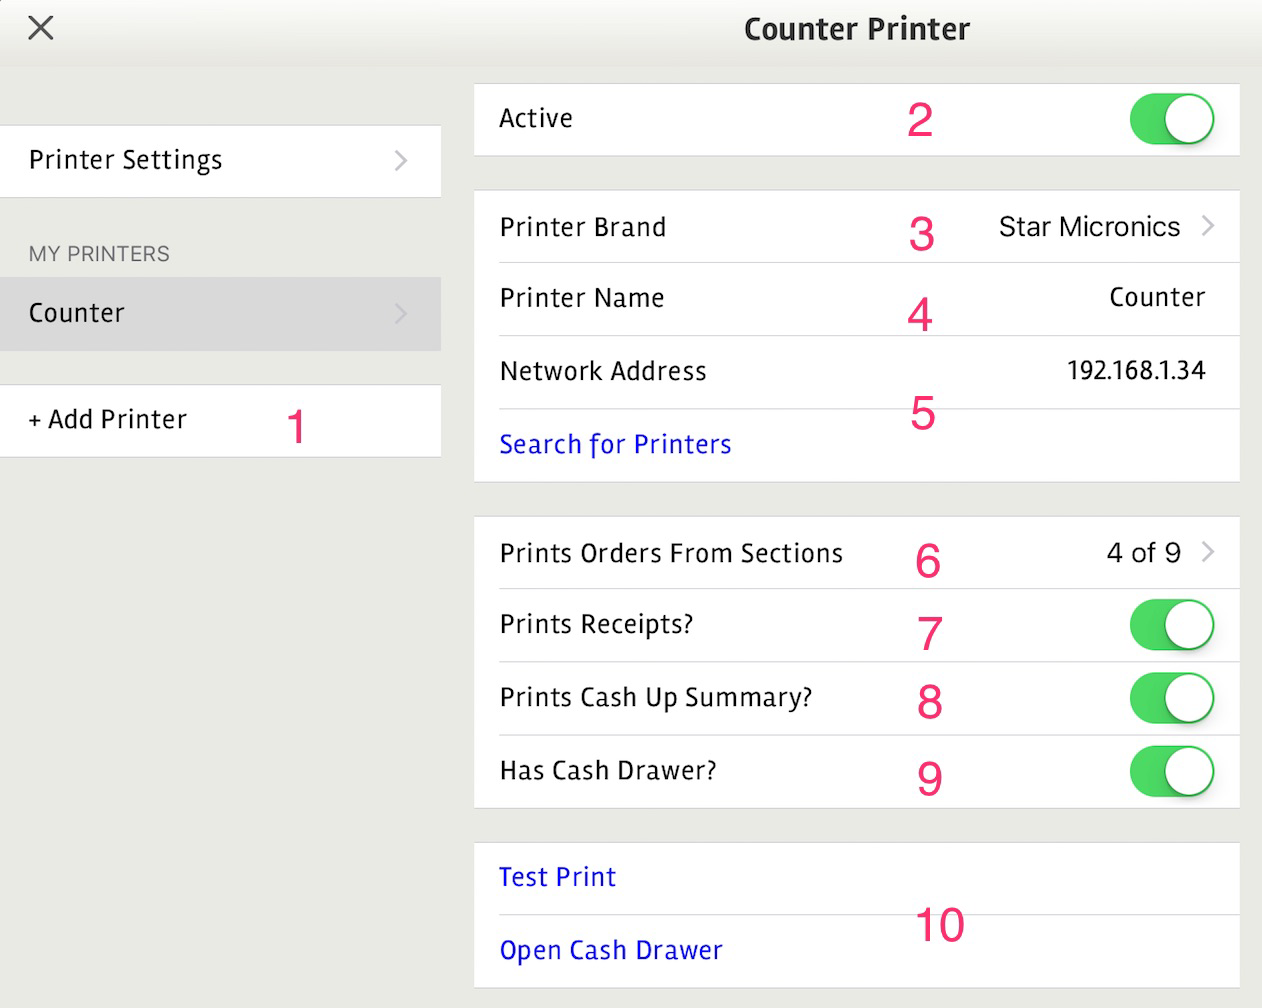 posBoss Printer Settings - Set up Printer